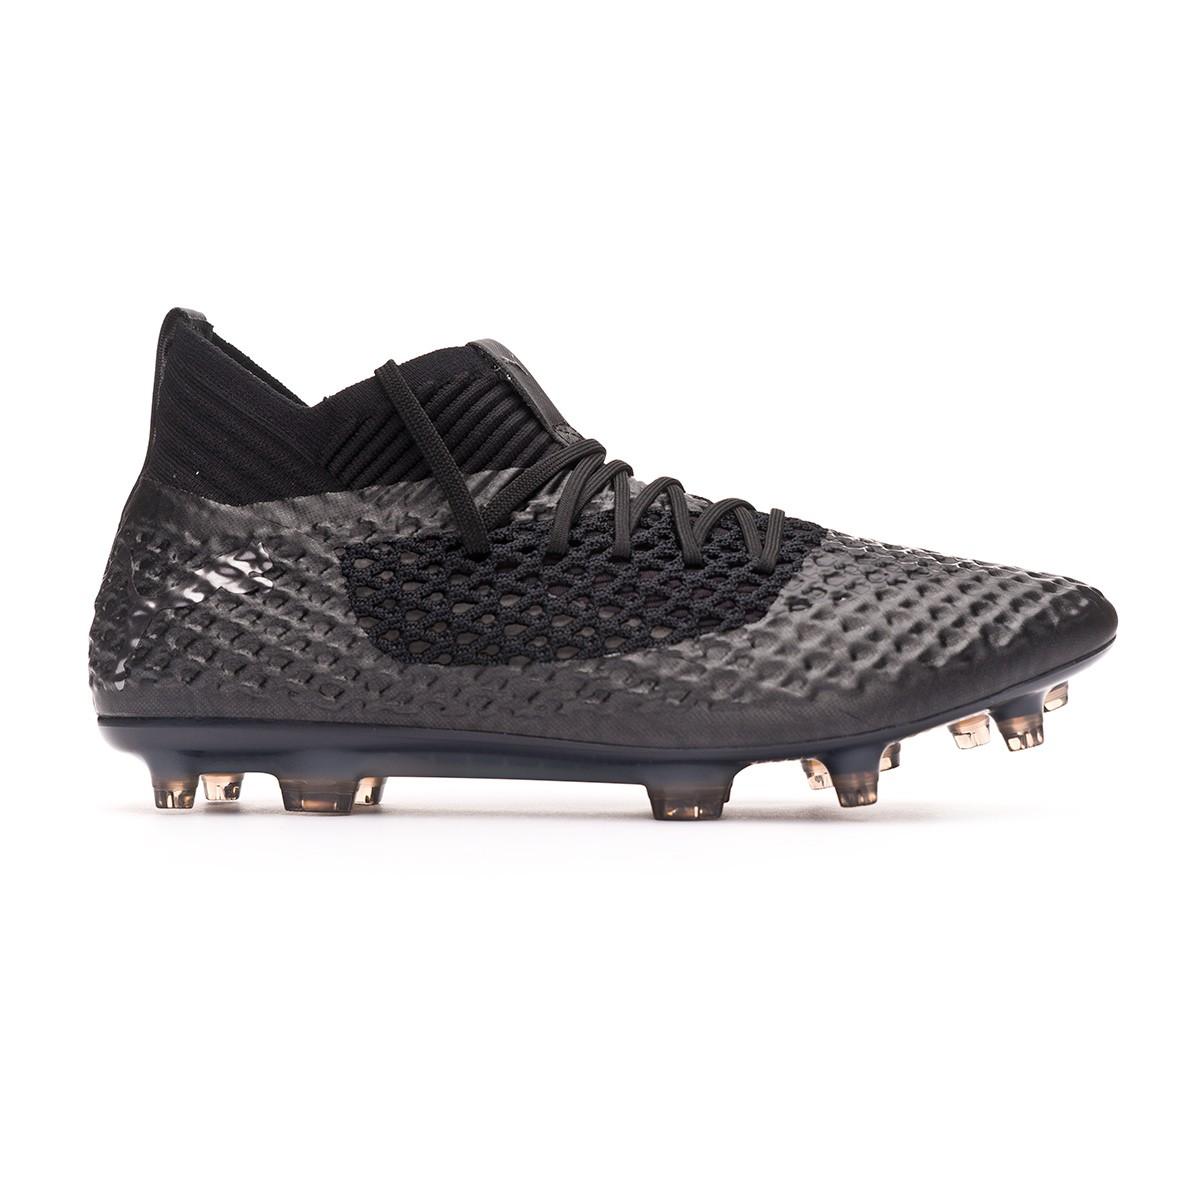 d2f4deaf4 Football Boots Puma Futurre 2.1 Netfit FG/AG Puma black - Football store  Fútbol Emotion